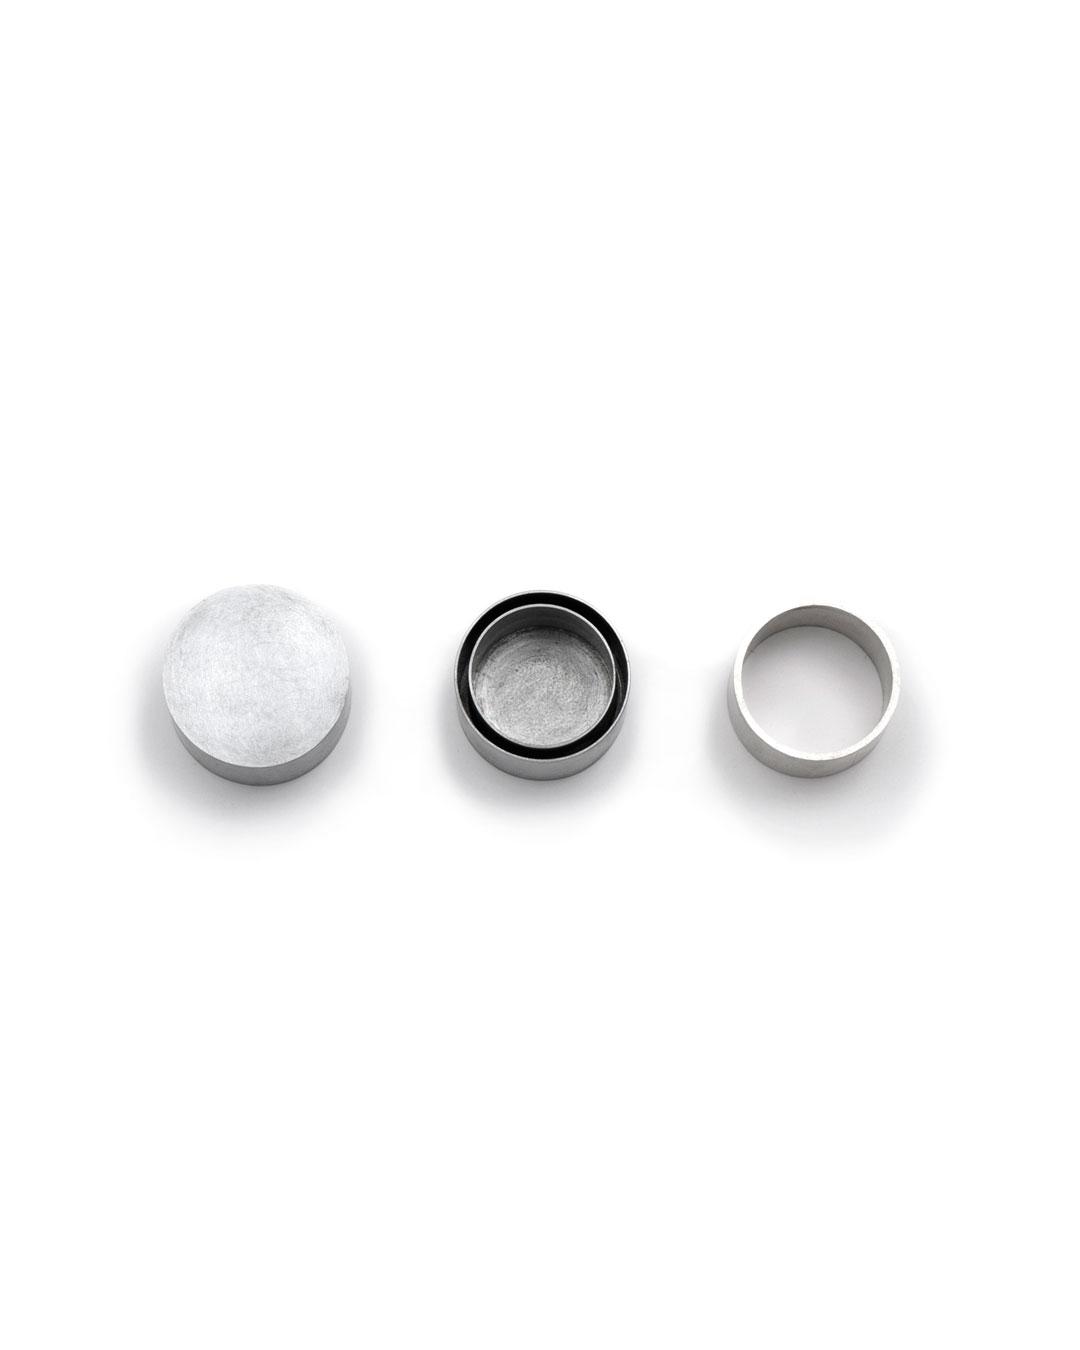 Junwon Jung, untitled, 2015, ring; titan zinc, silver, ø 30 x 17 mm, €850